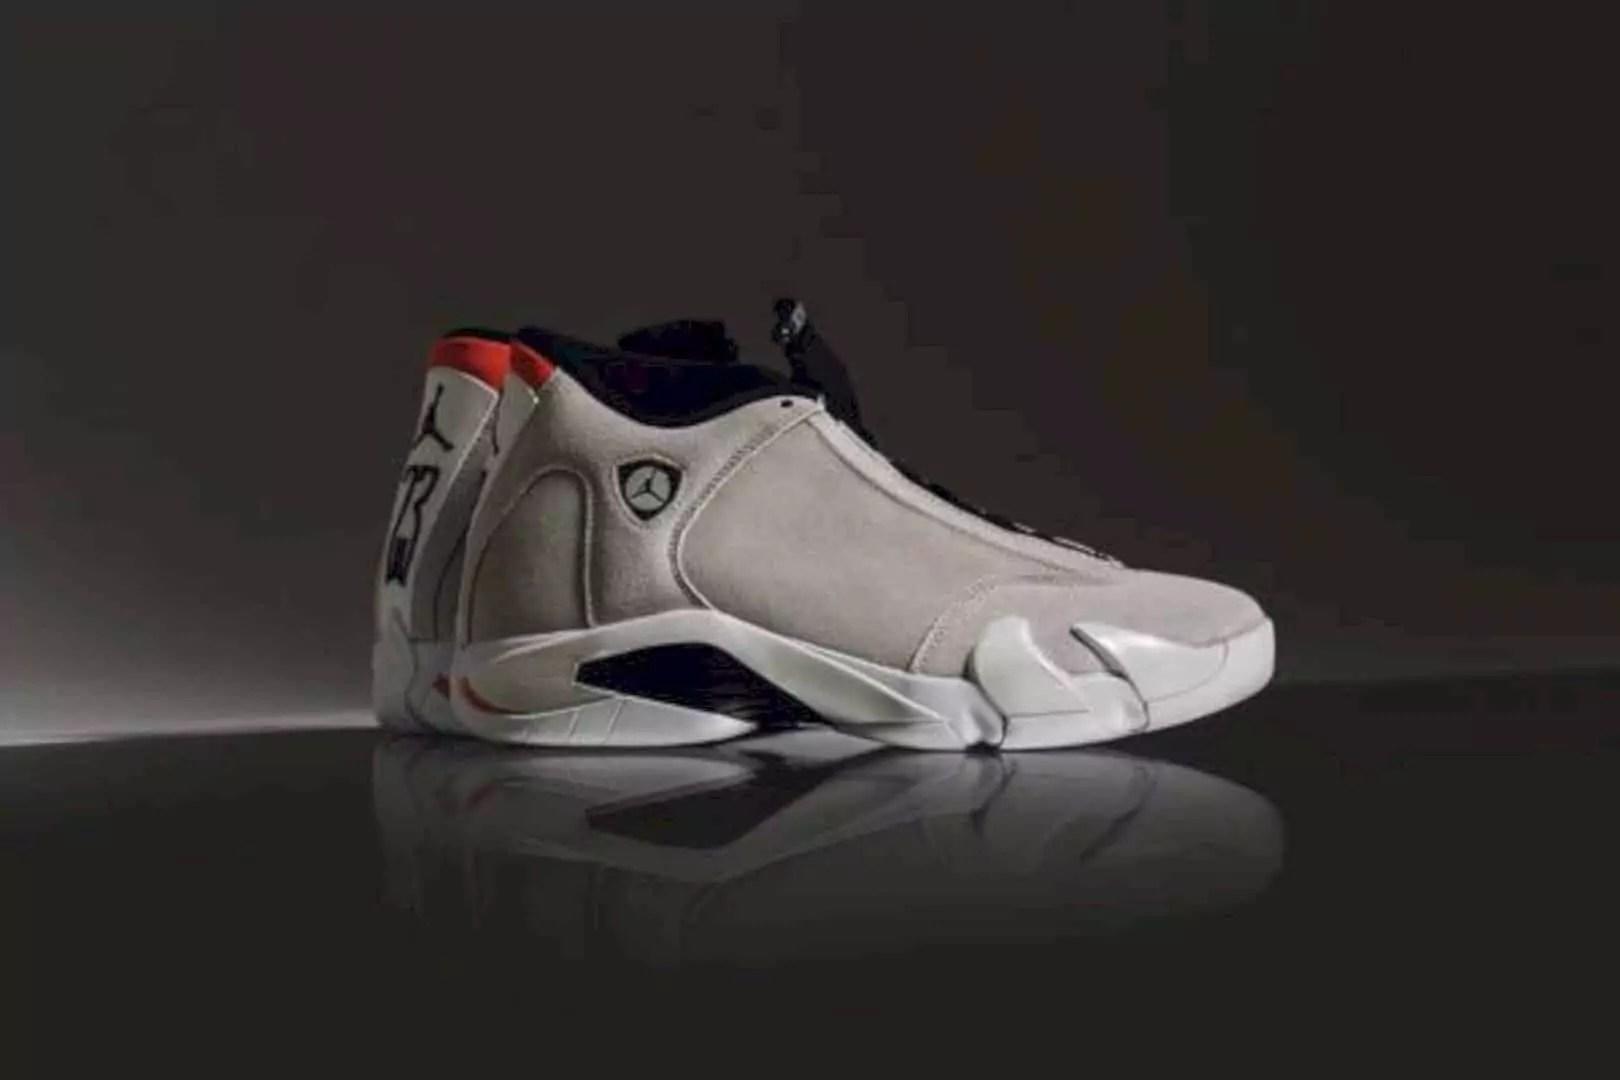 Air Jordan 14 Retro - Desert: The Last of the Signature Line from MJ